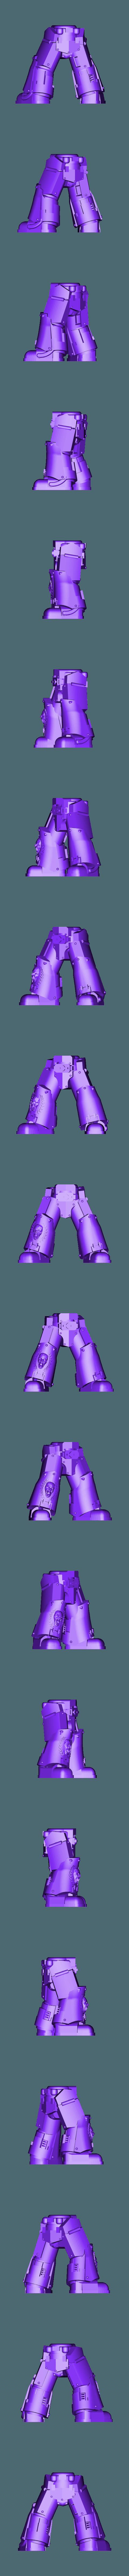 Legs_1_repaired.stl Download free STL file 1000 Followers! 3rd Legion - FireBird Terminators • 3D printing model, ThatEvilOne